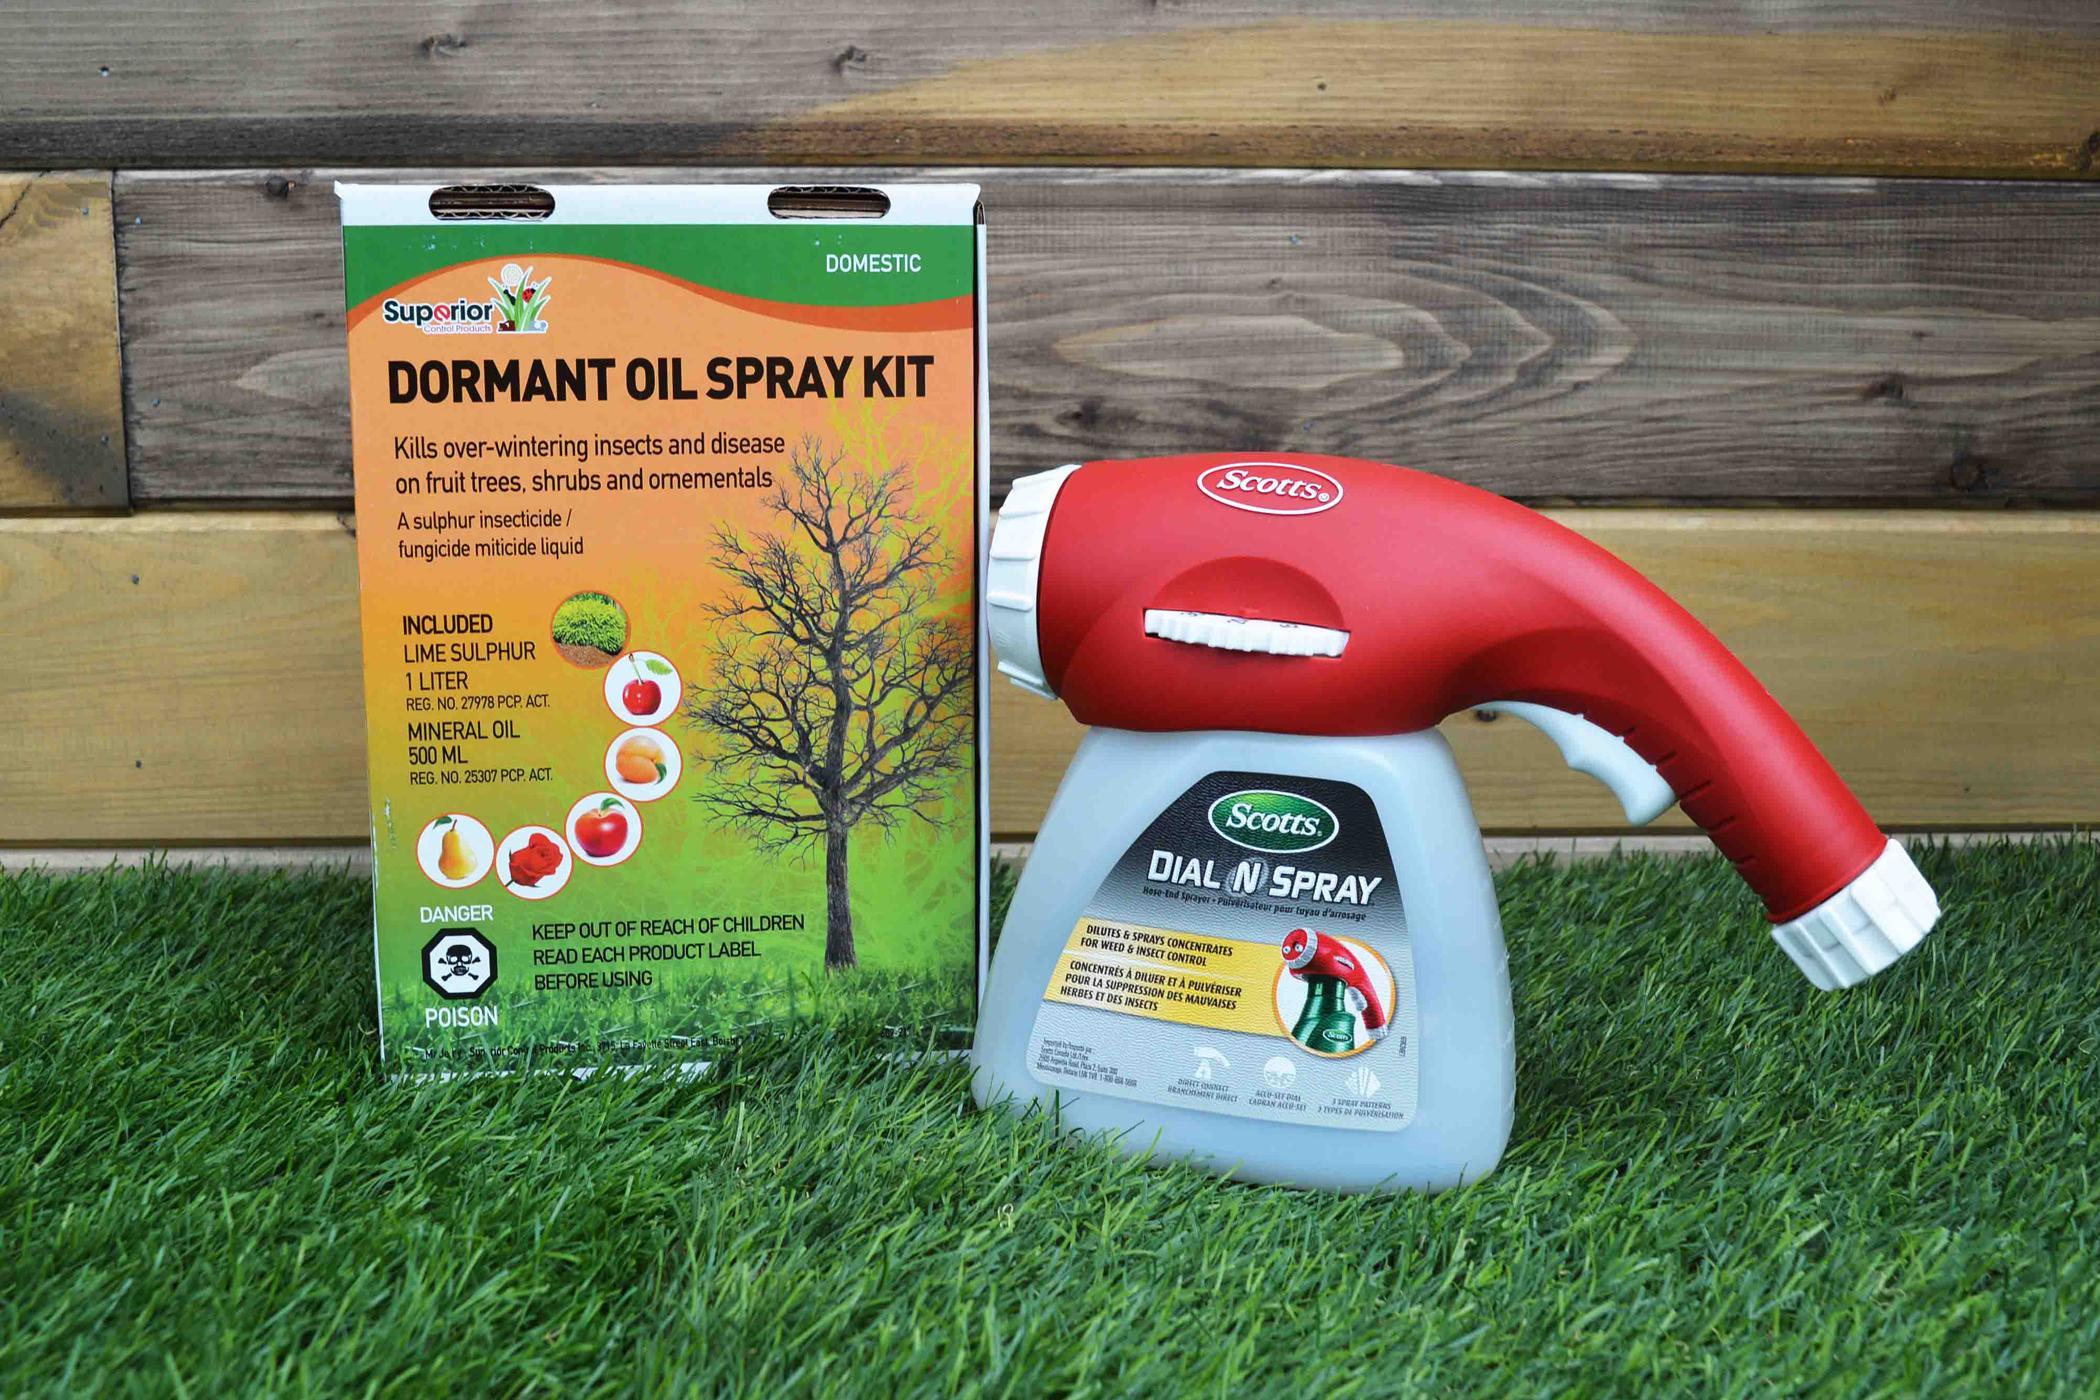 Superior controls dormant spray kit and dial n spray.jpg